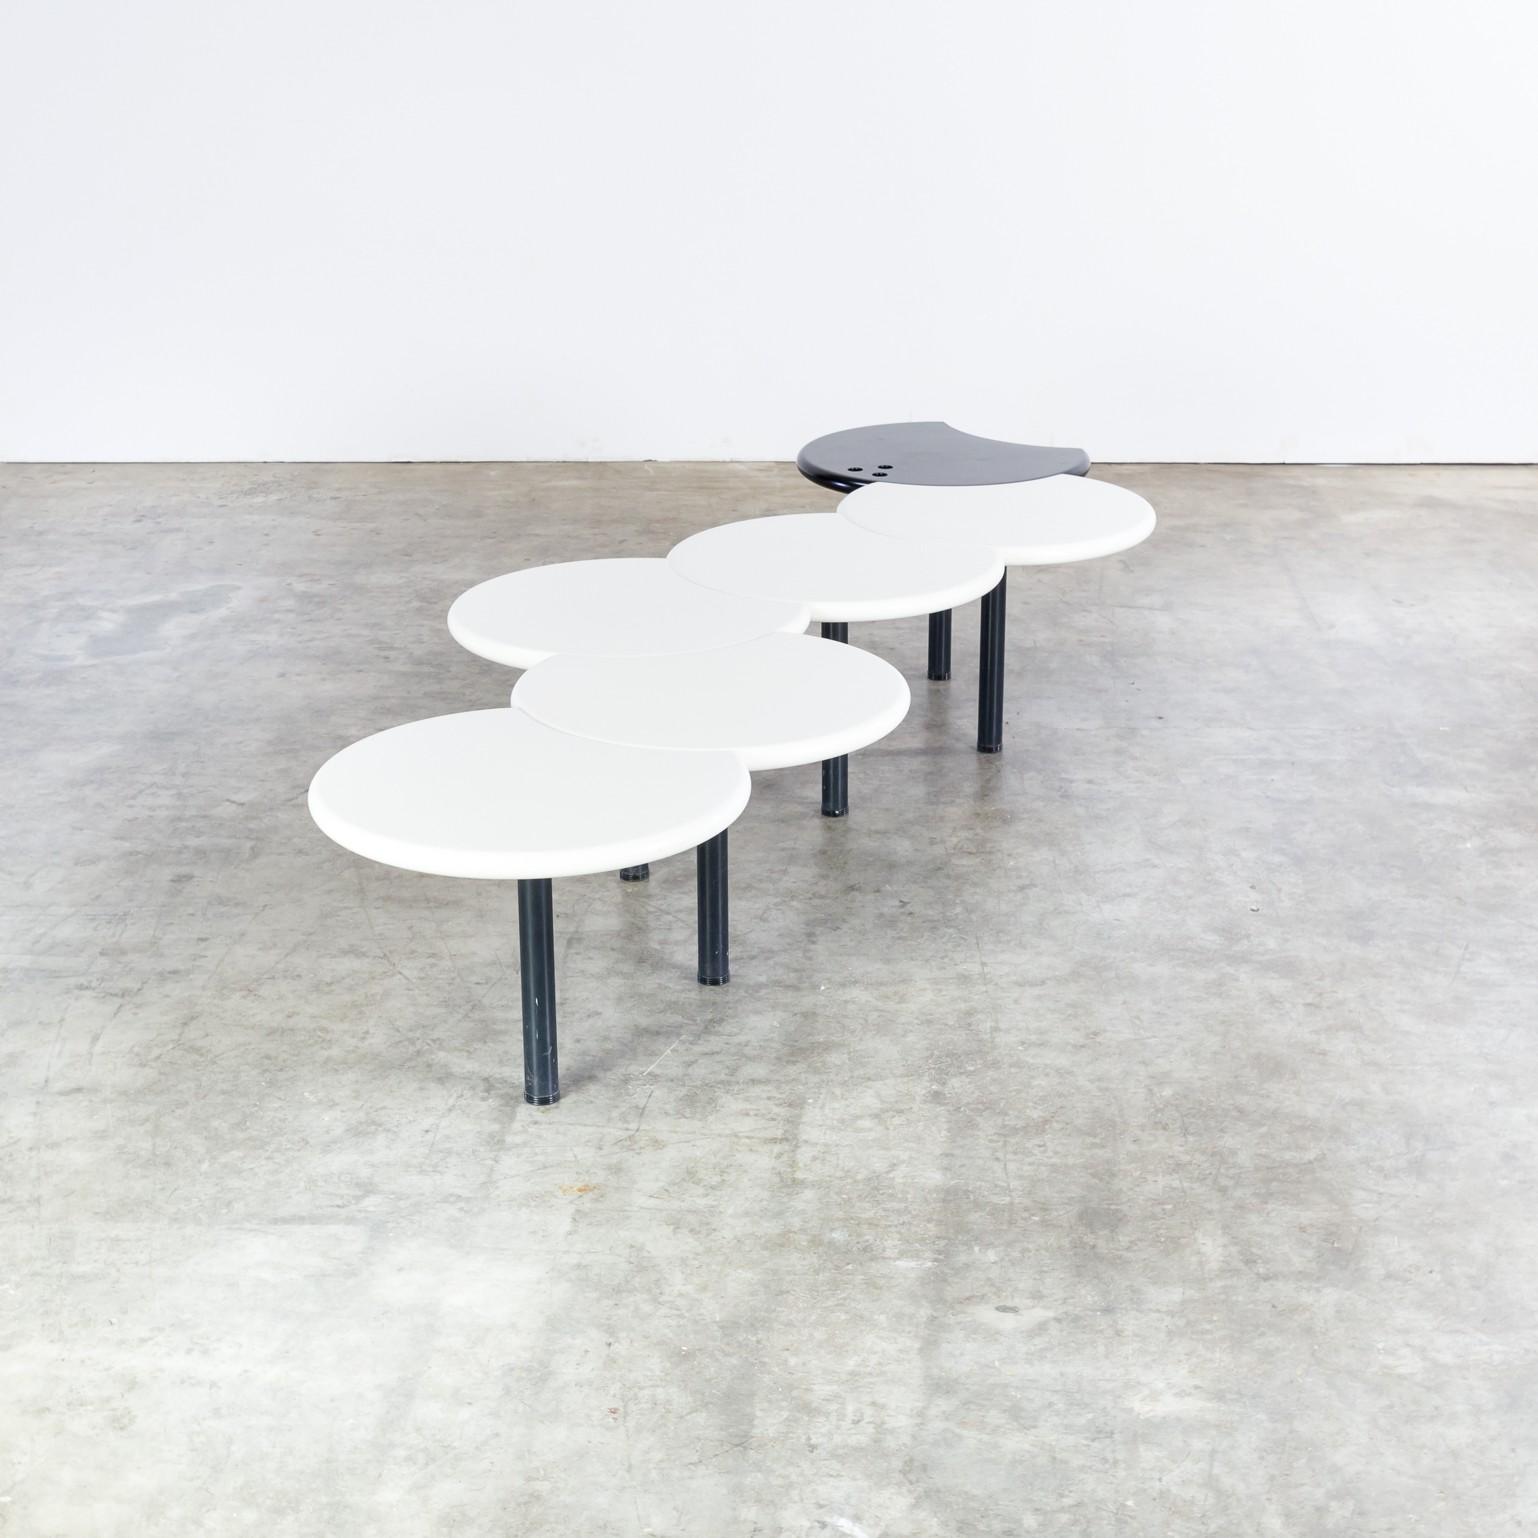 Modular snake adjustable coffee table 1980s Design Market